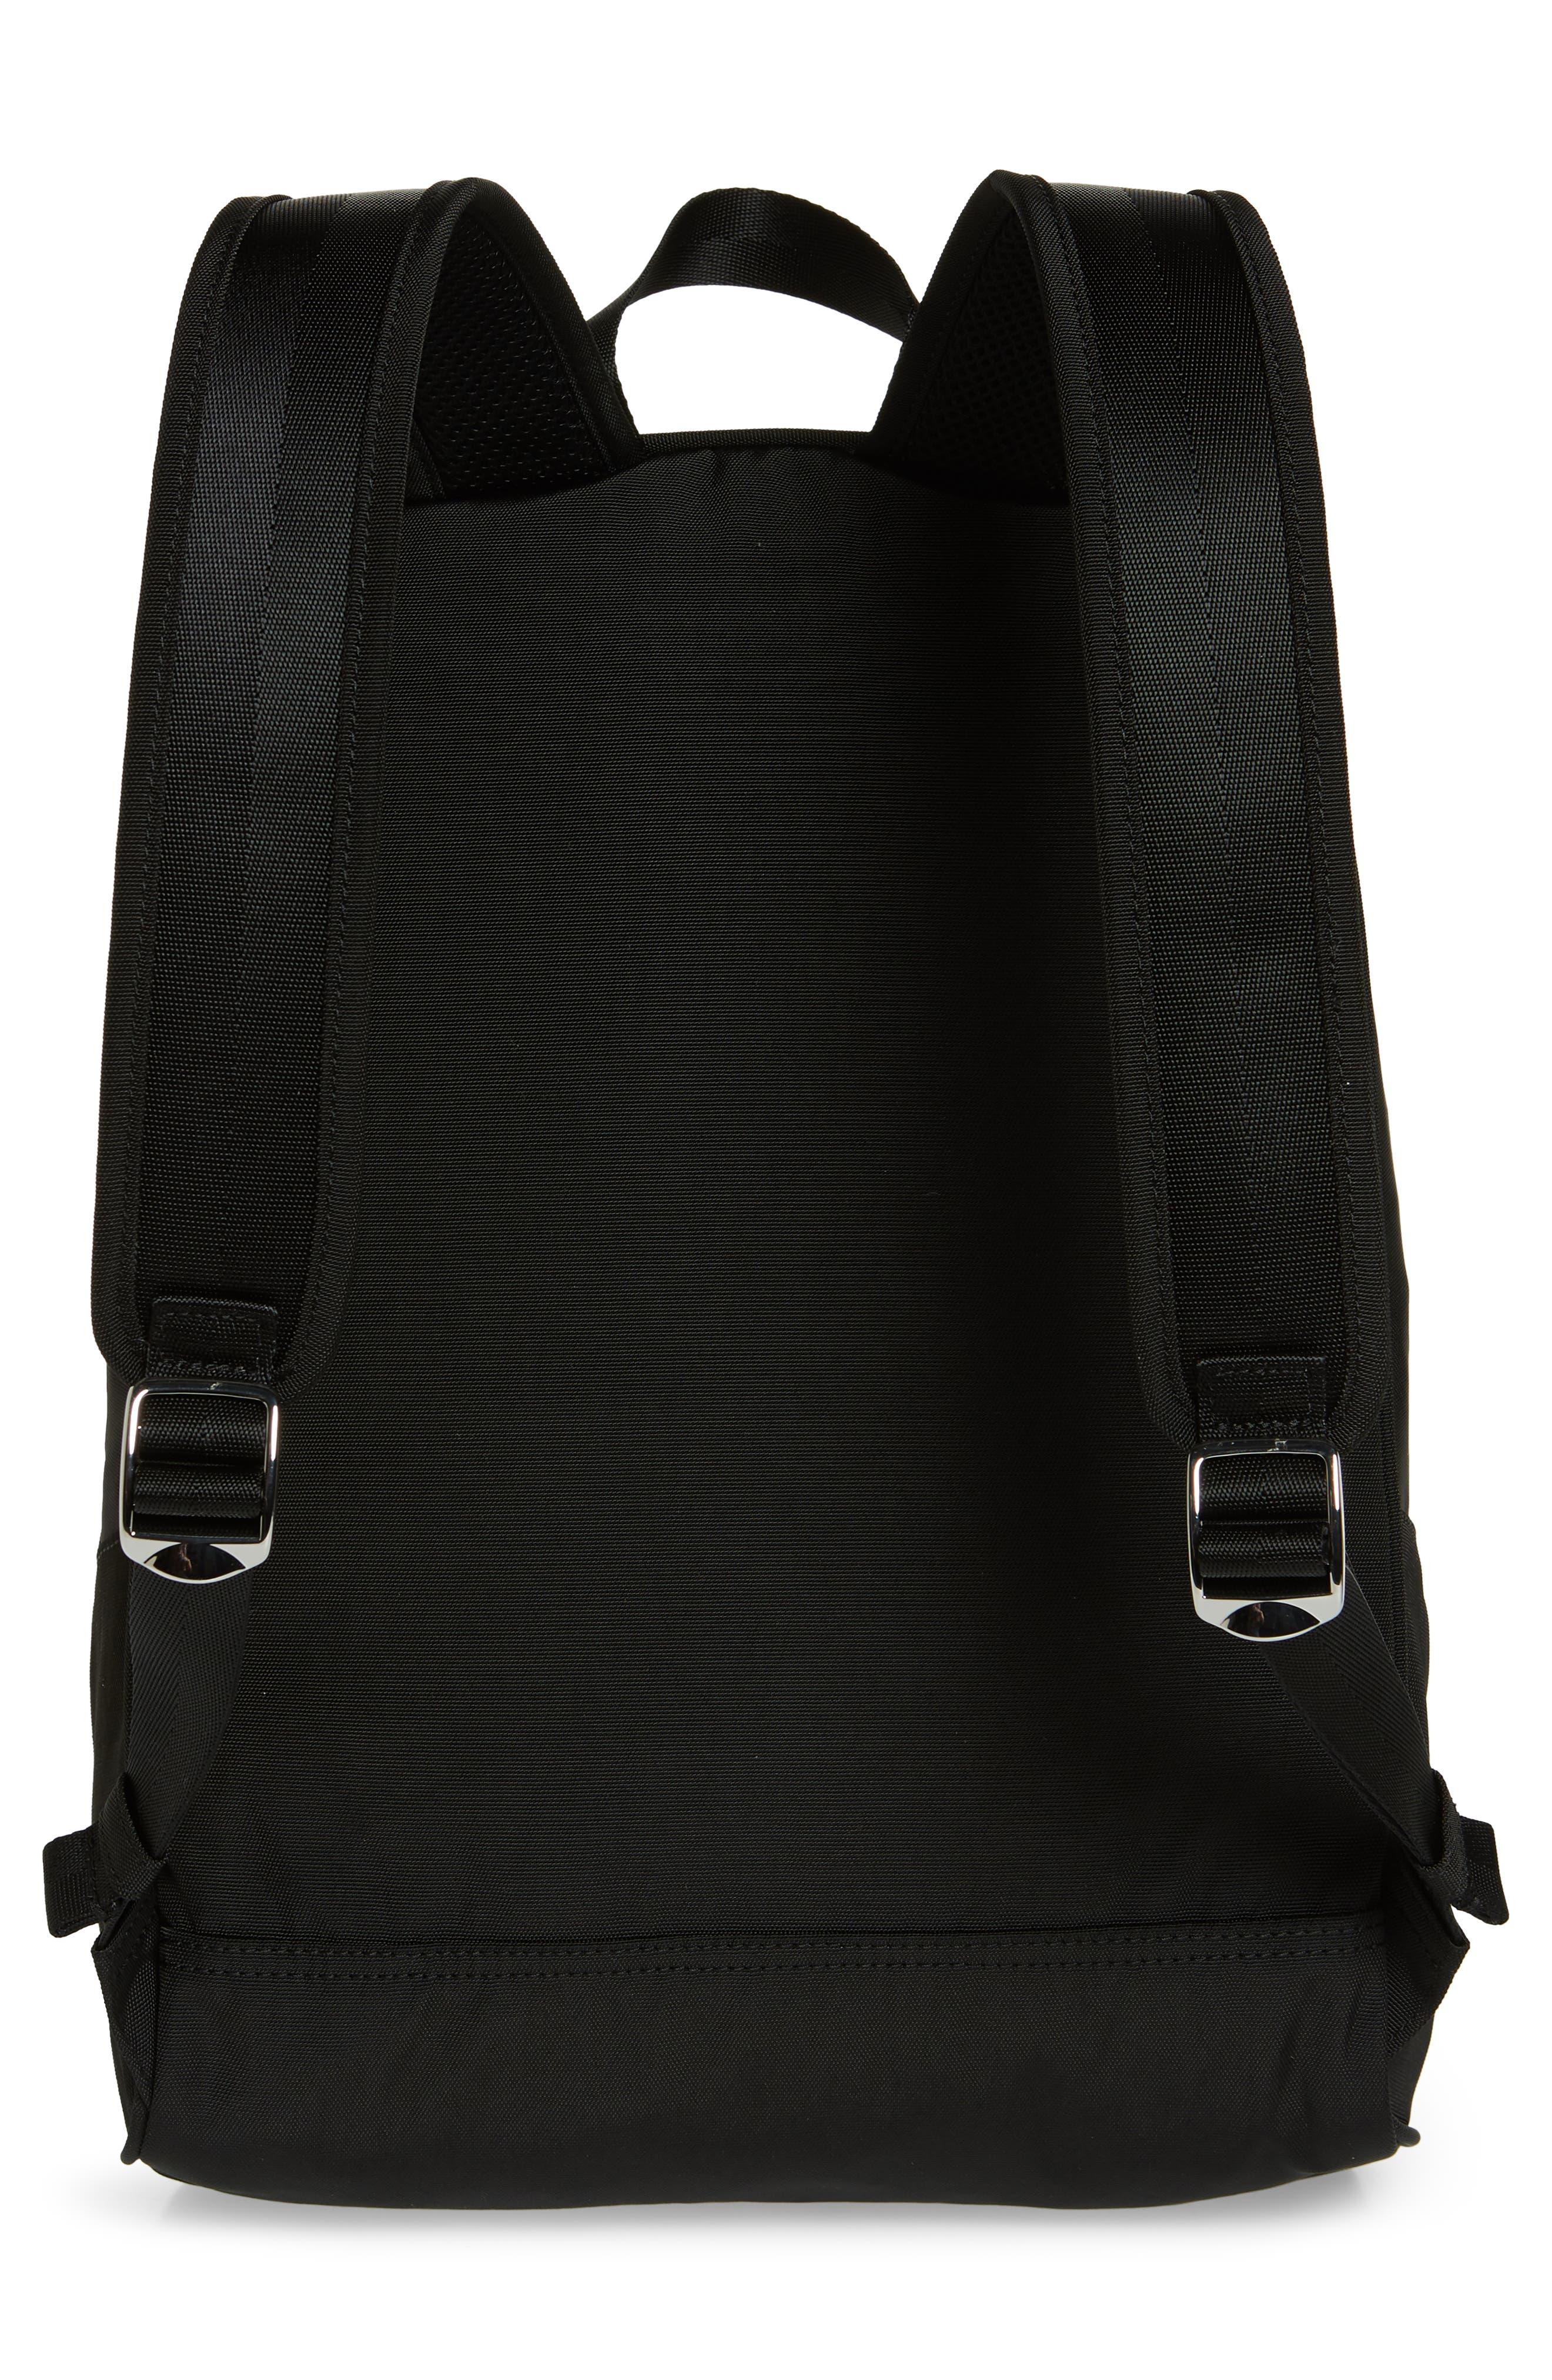 KENZO, Tiger Backpack, Alternate thumbnail 3, color, BLACK